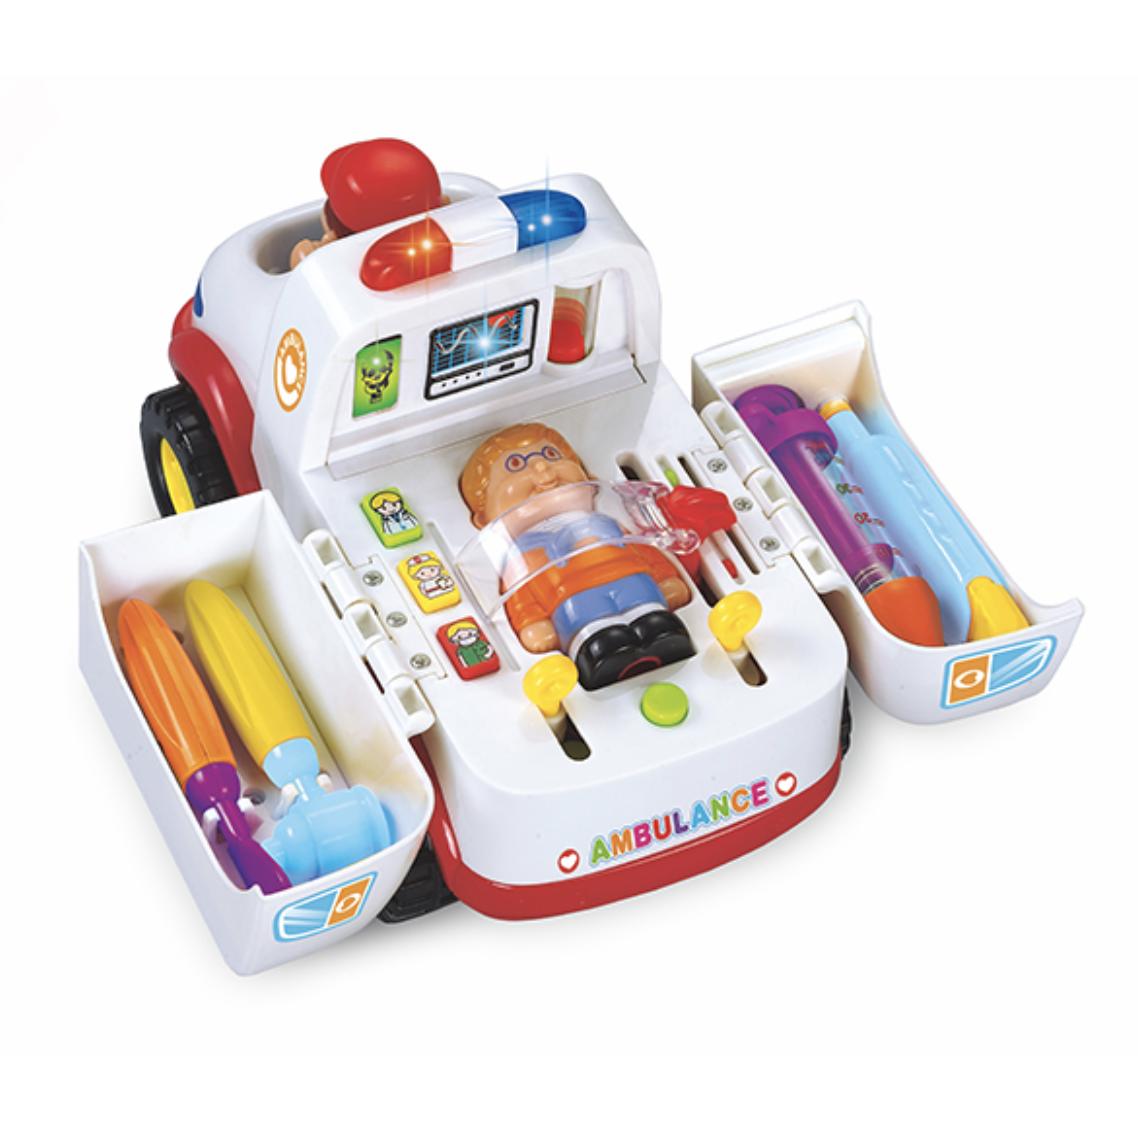 Ambulancia de Aprendizaje - Código: 836